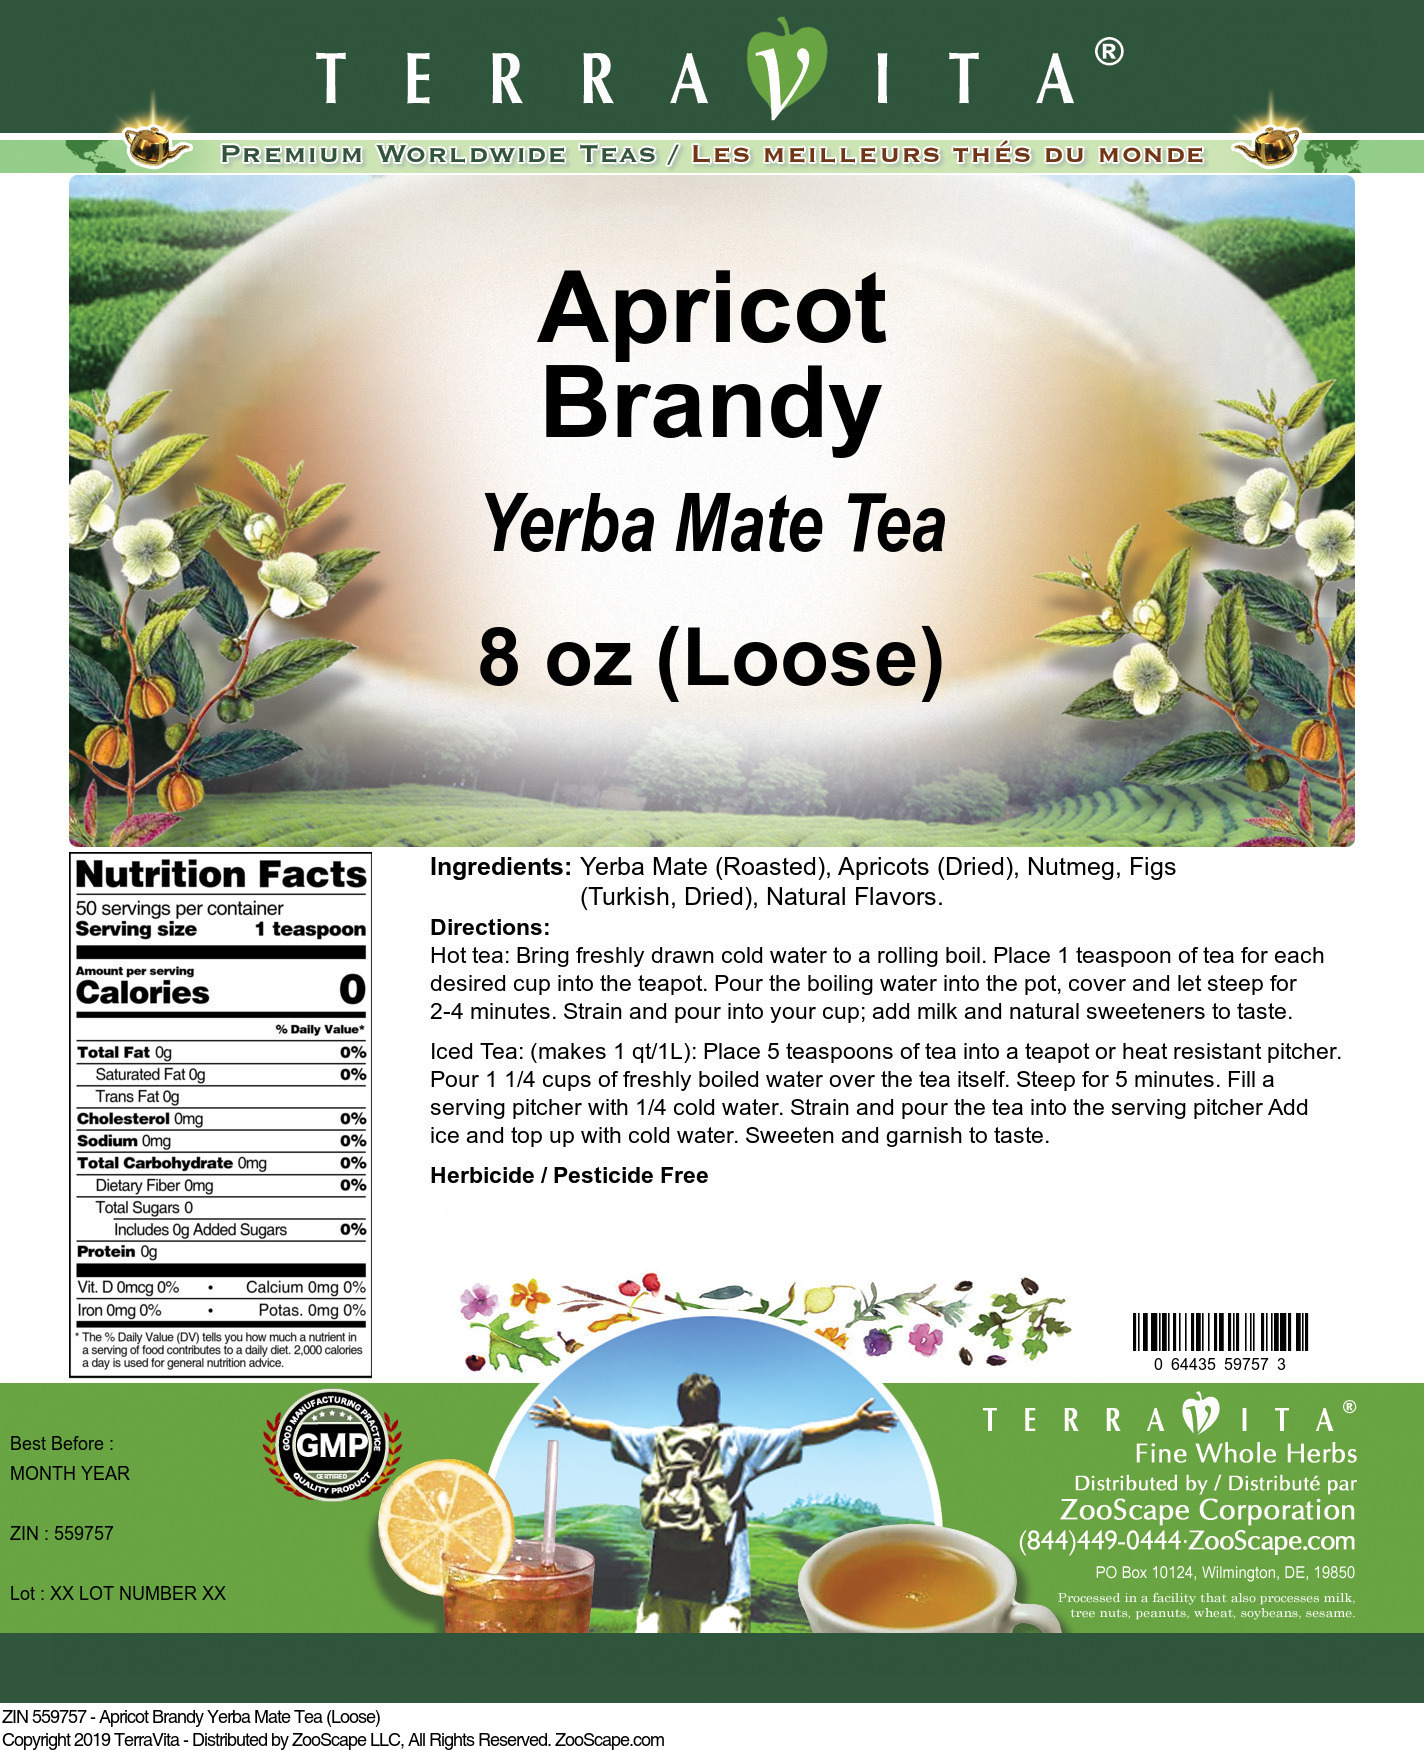 Apricot Brandy Yerba Mate Tea (Loose)